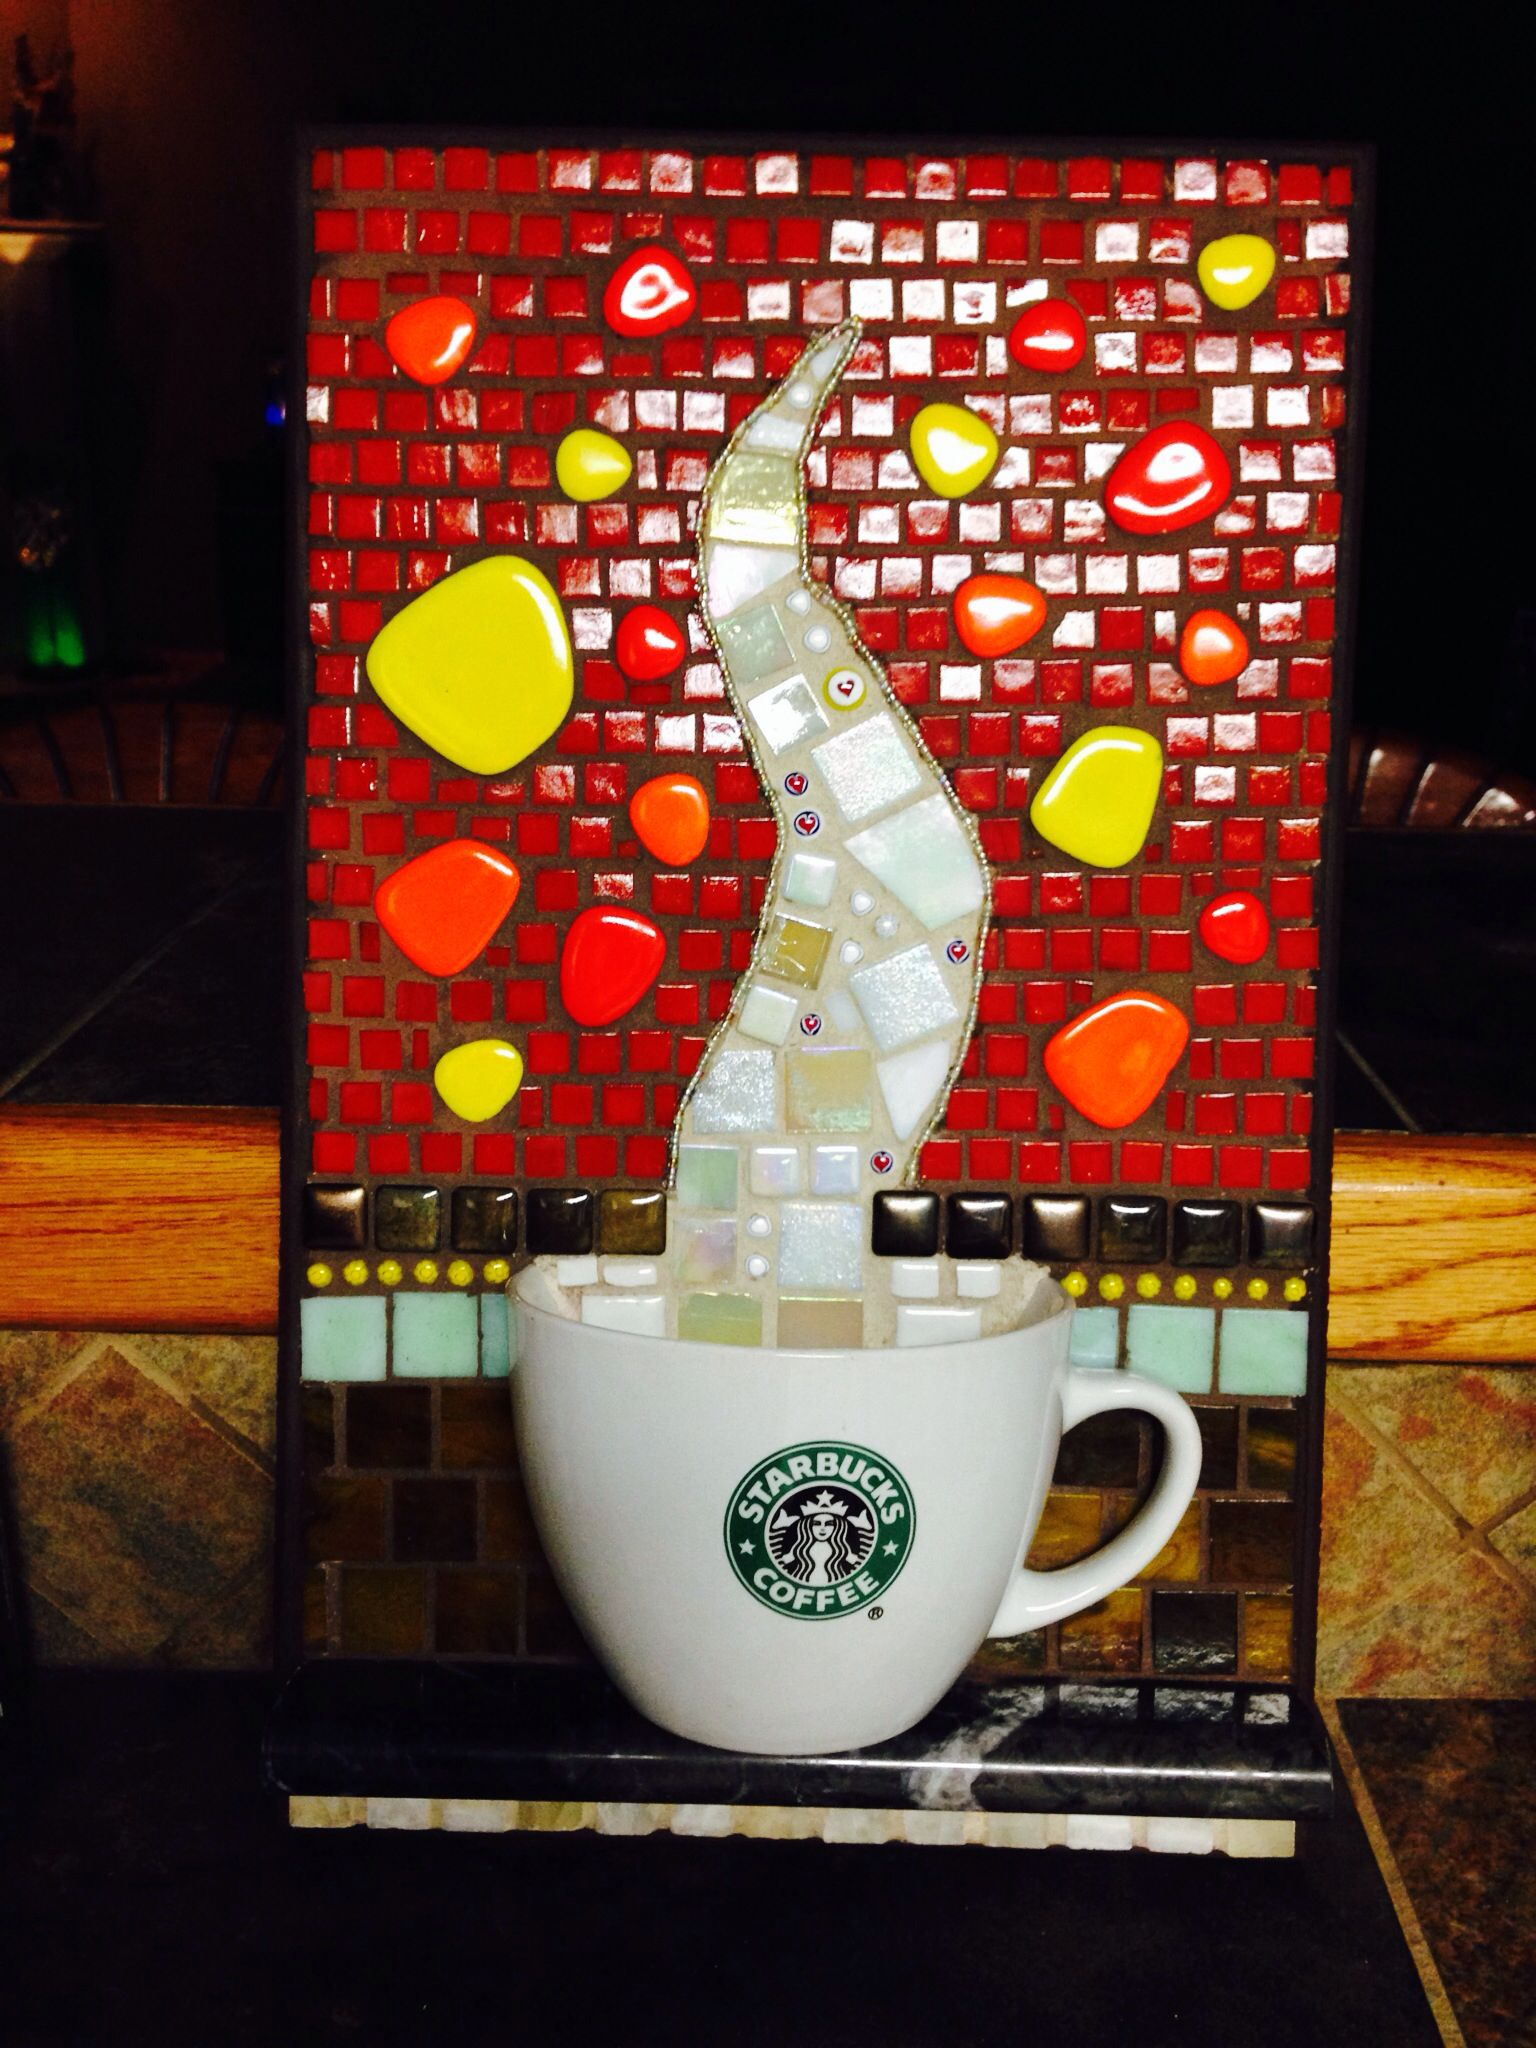 Starbucks coffee cup Mosaic art, Mosaic projects, Mosaic